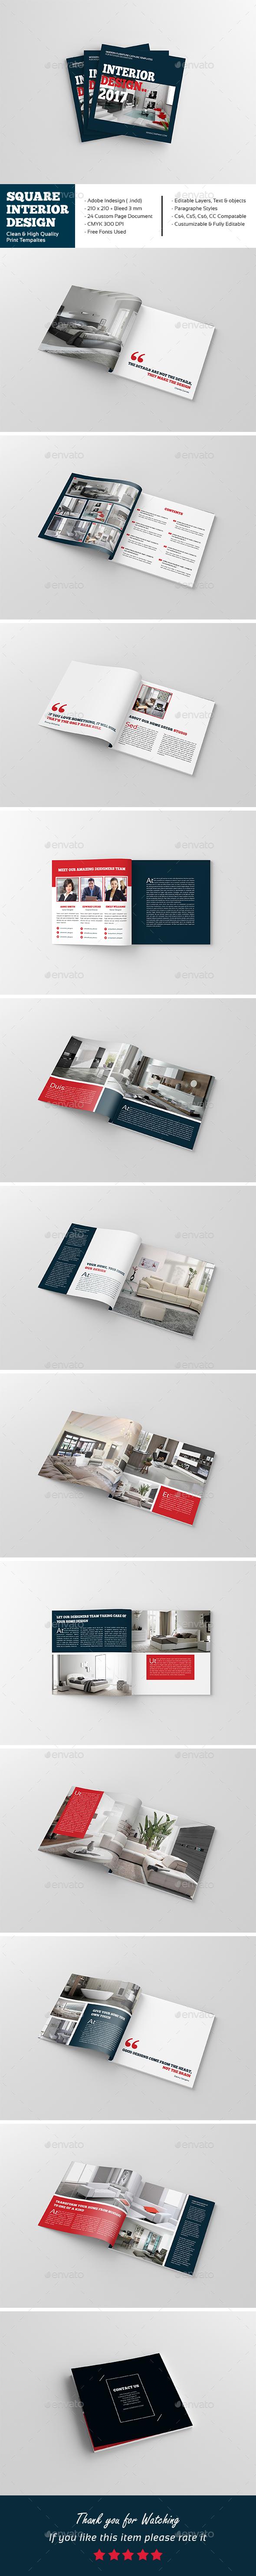 Square Interior Design Brochure - Catalogs Brochures